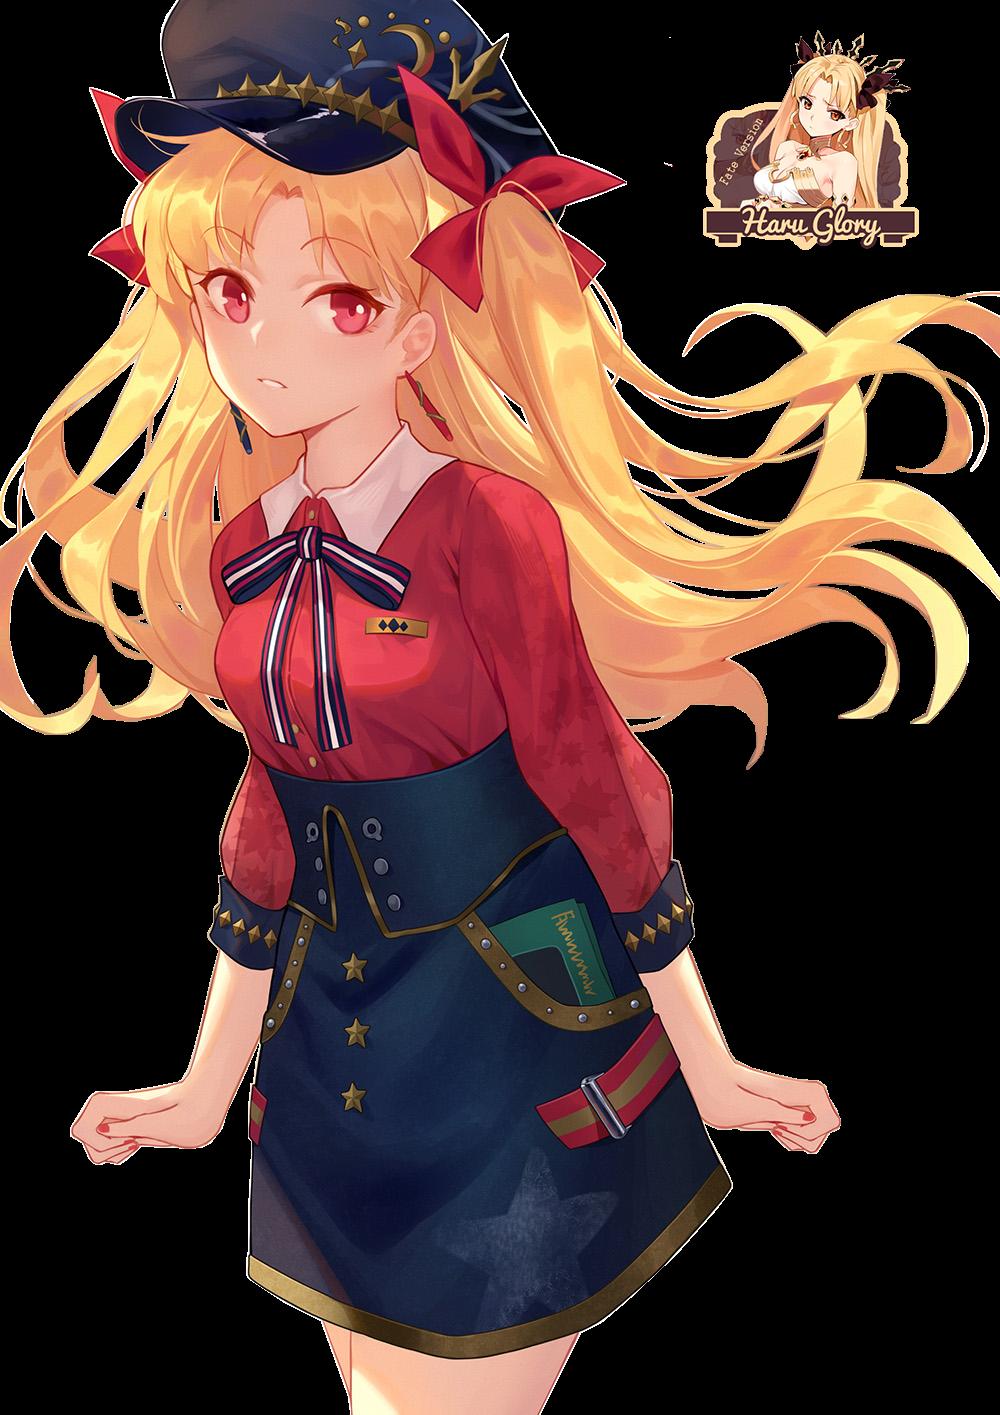 Tohsaka Rin 490 (Ereshkigal)